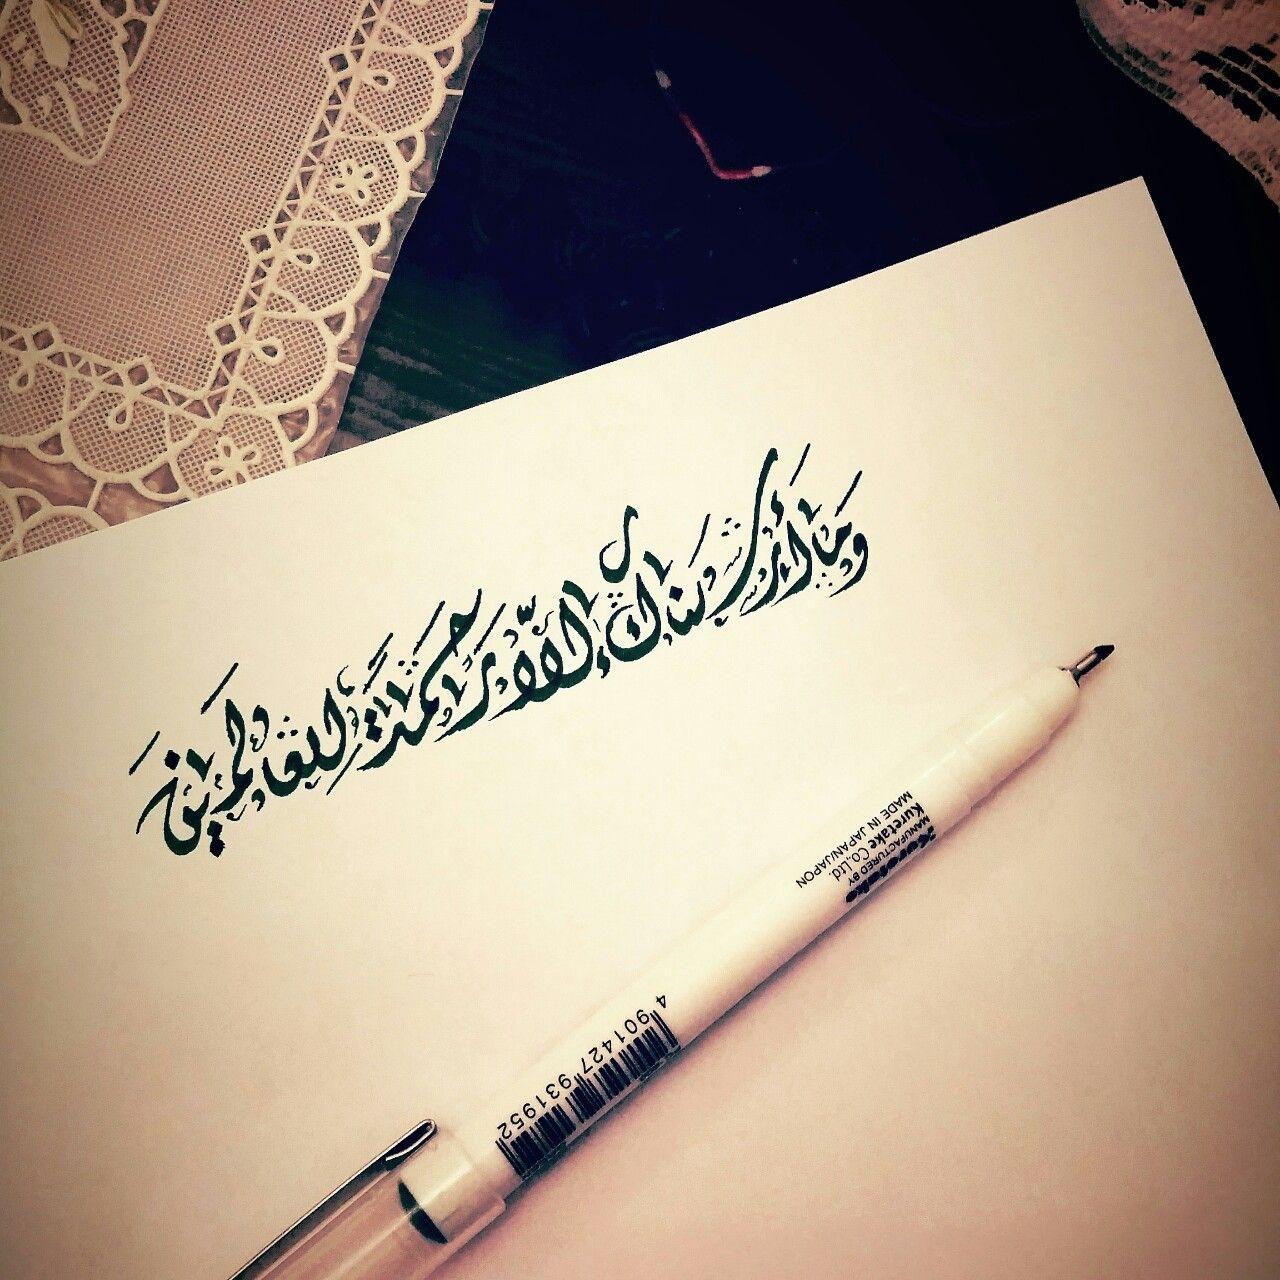 Calligraphy Gharbiya وما ارسلناك الا رحمة Arabic Calligraphy Calligraphy